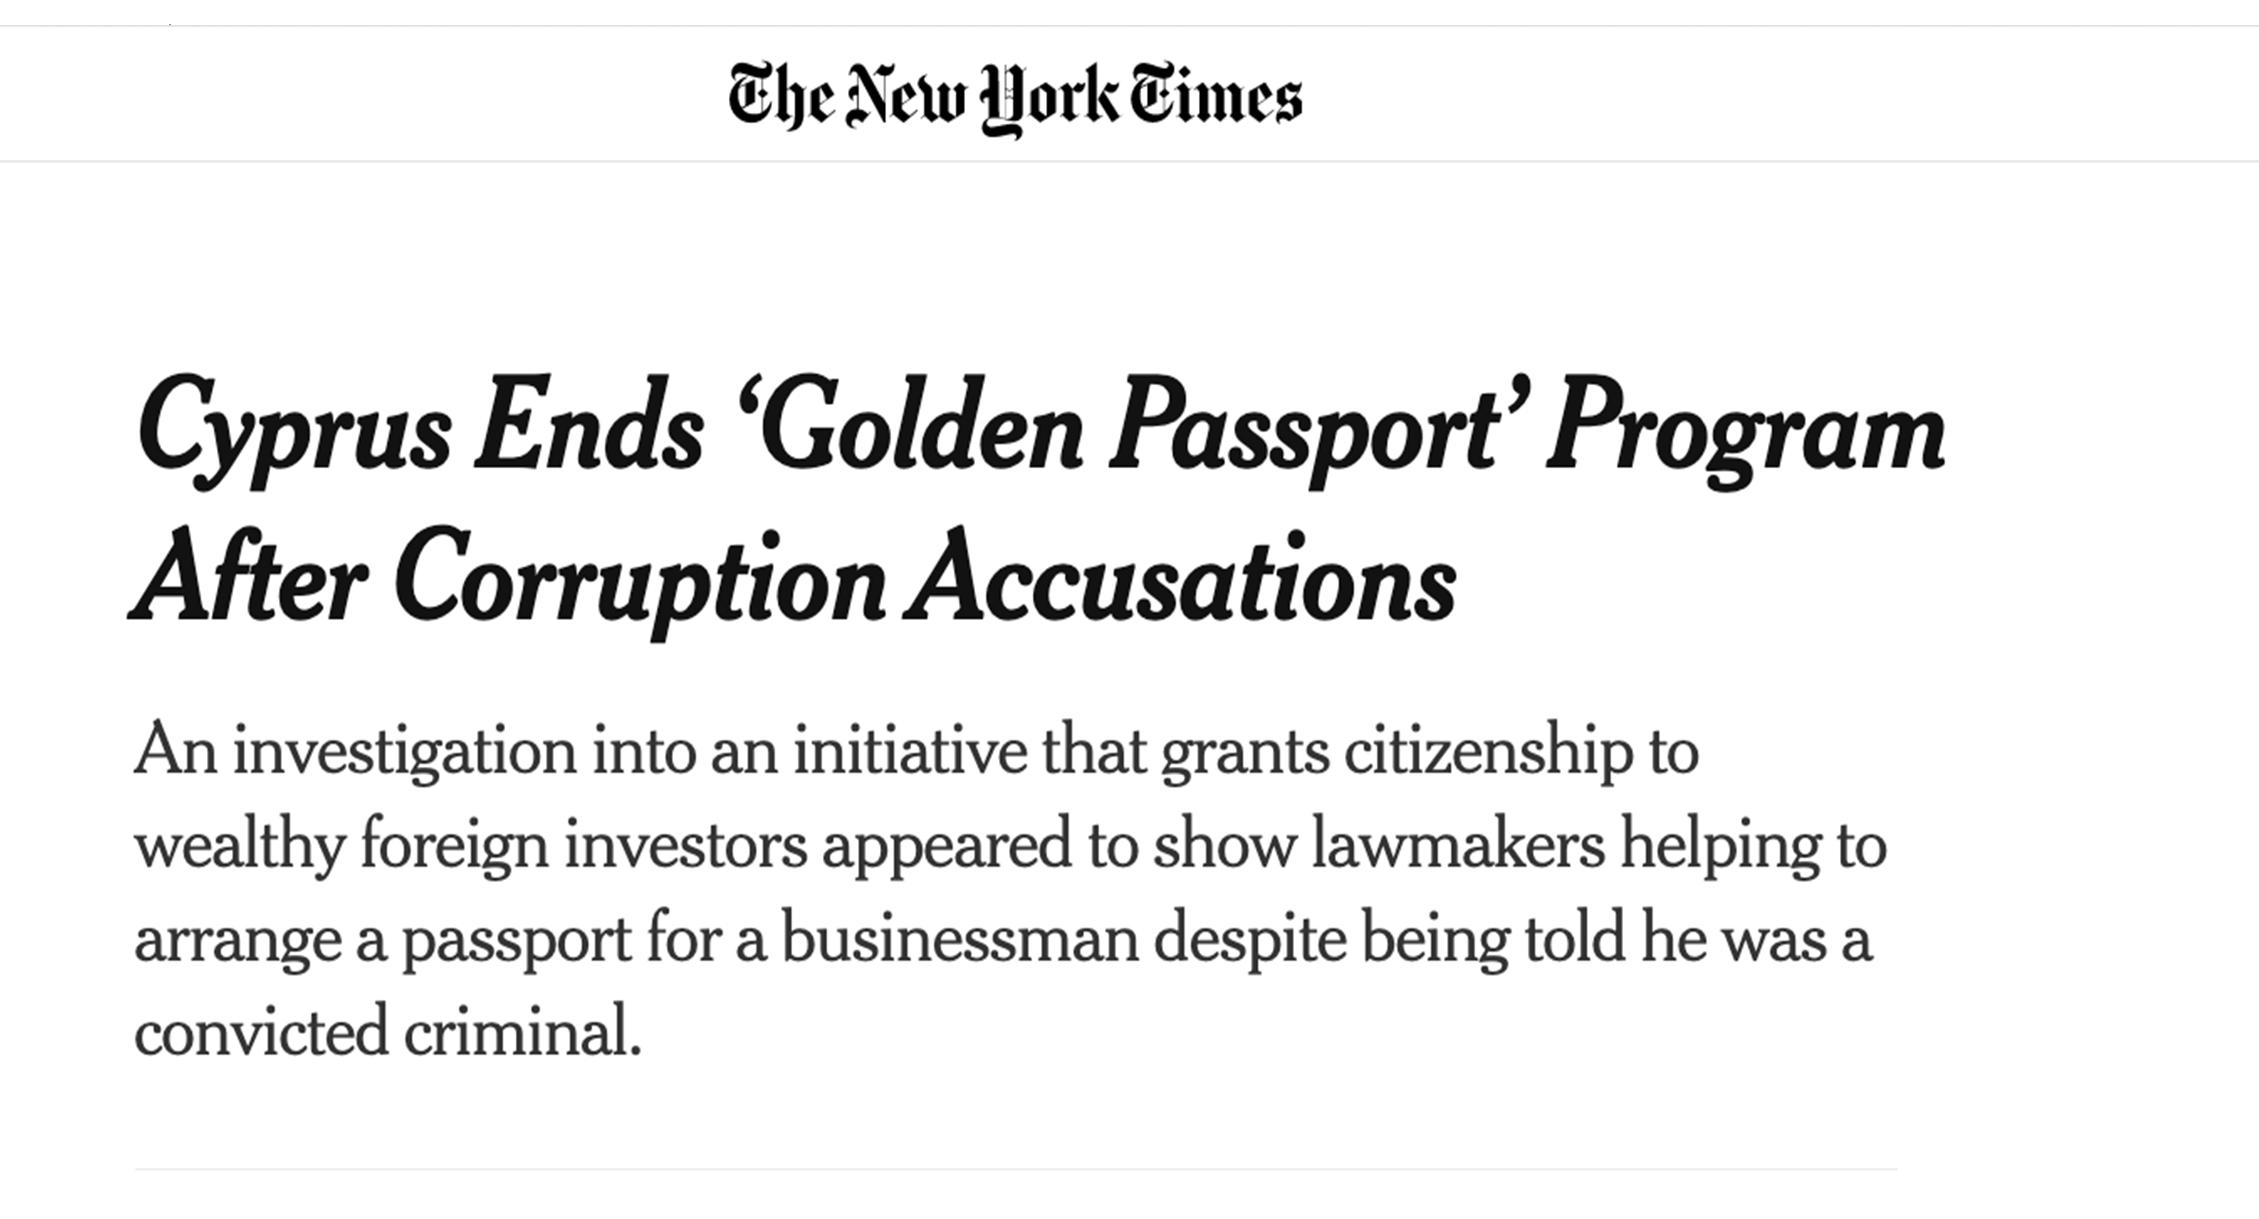 NYT: Cyprus Ends 'Golden Passport' Program